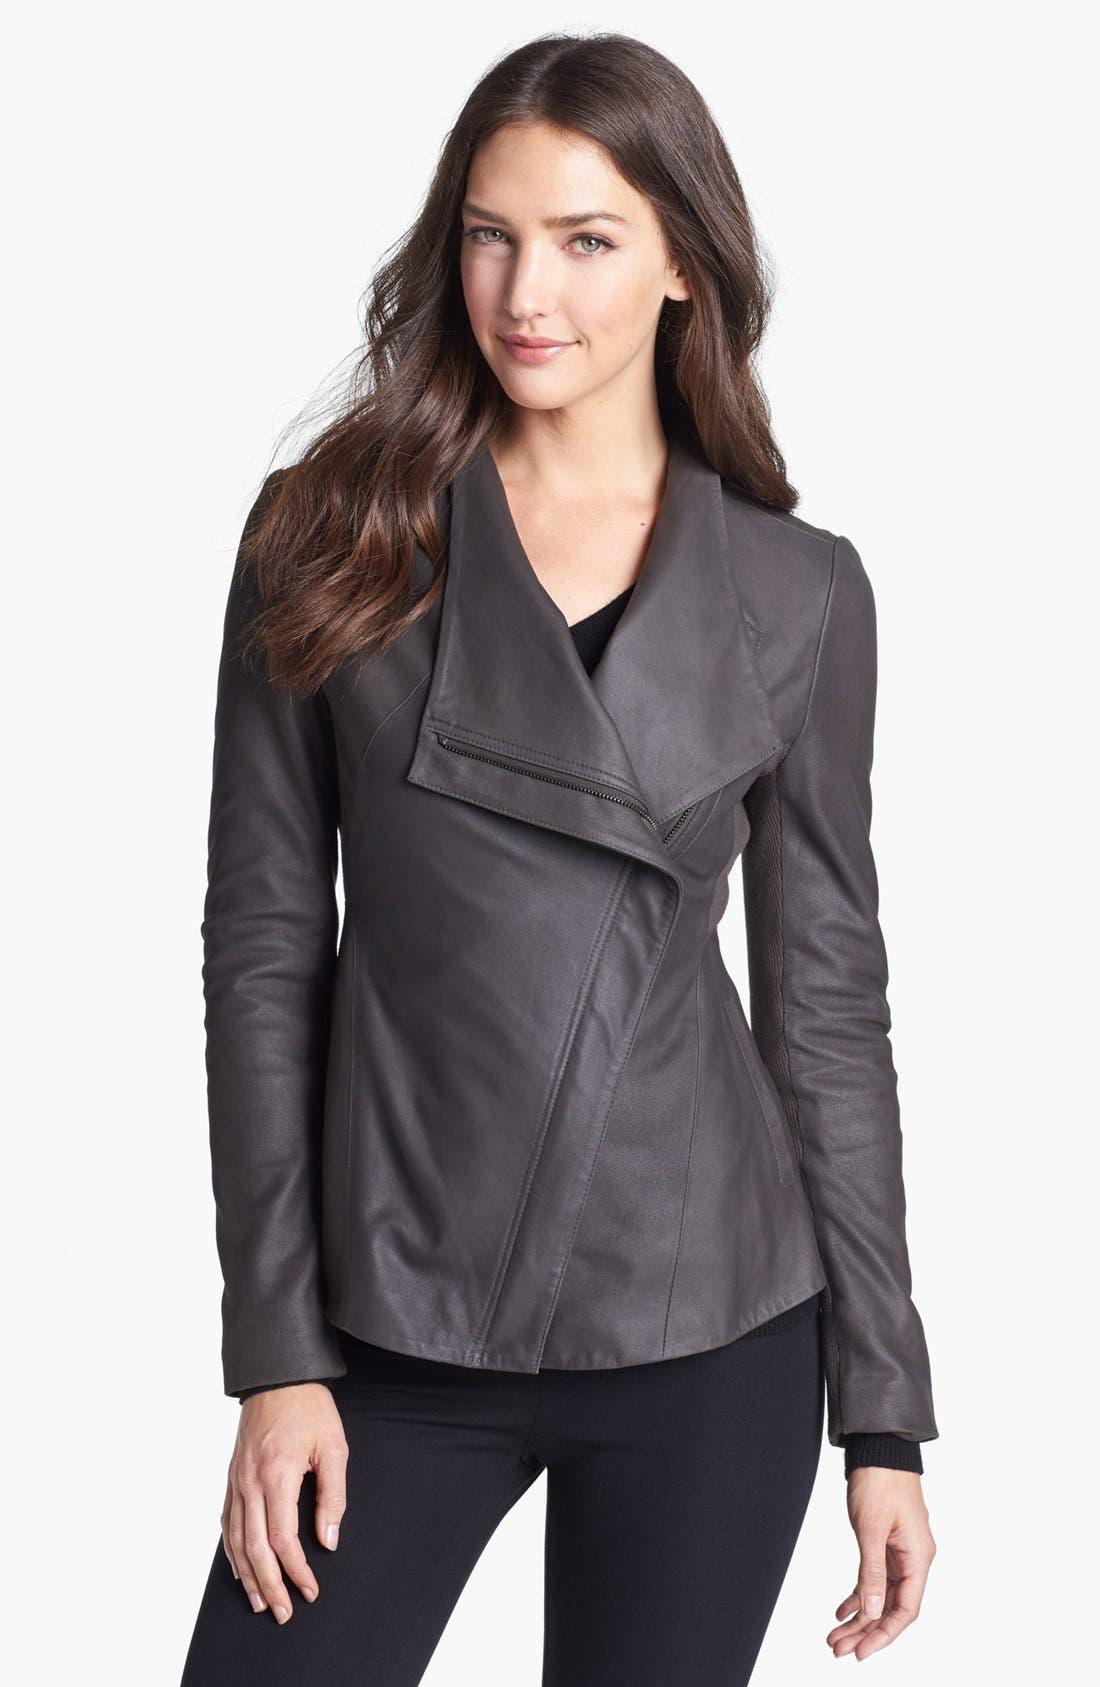 Main Image - Elie Tahari 'Constance' Peplum Back Leather Jacket